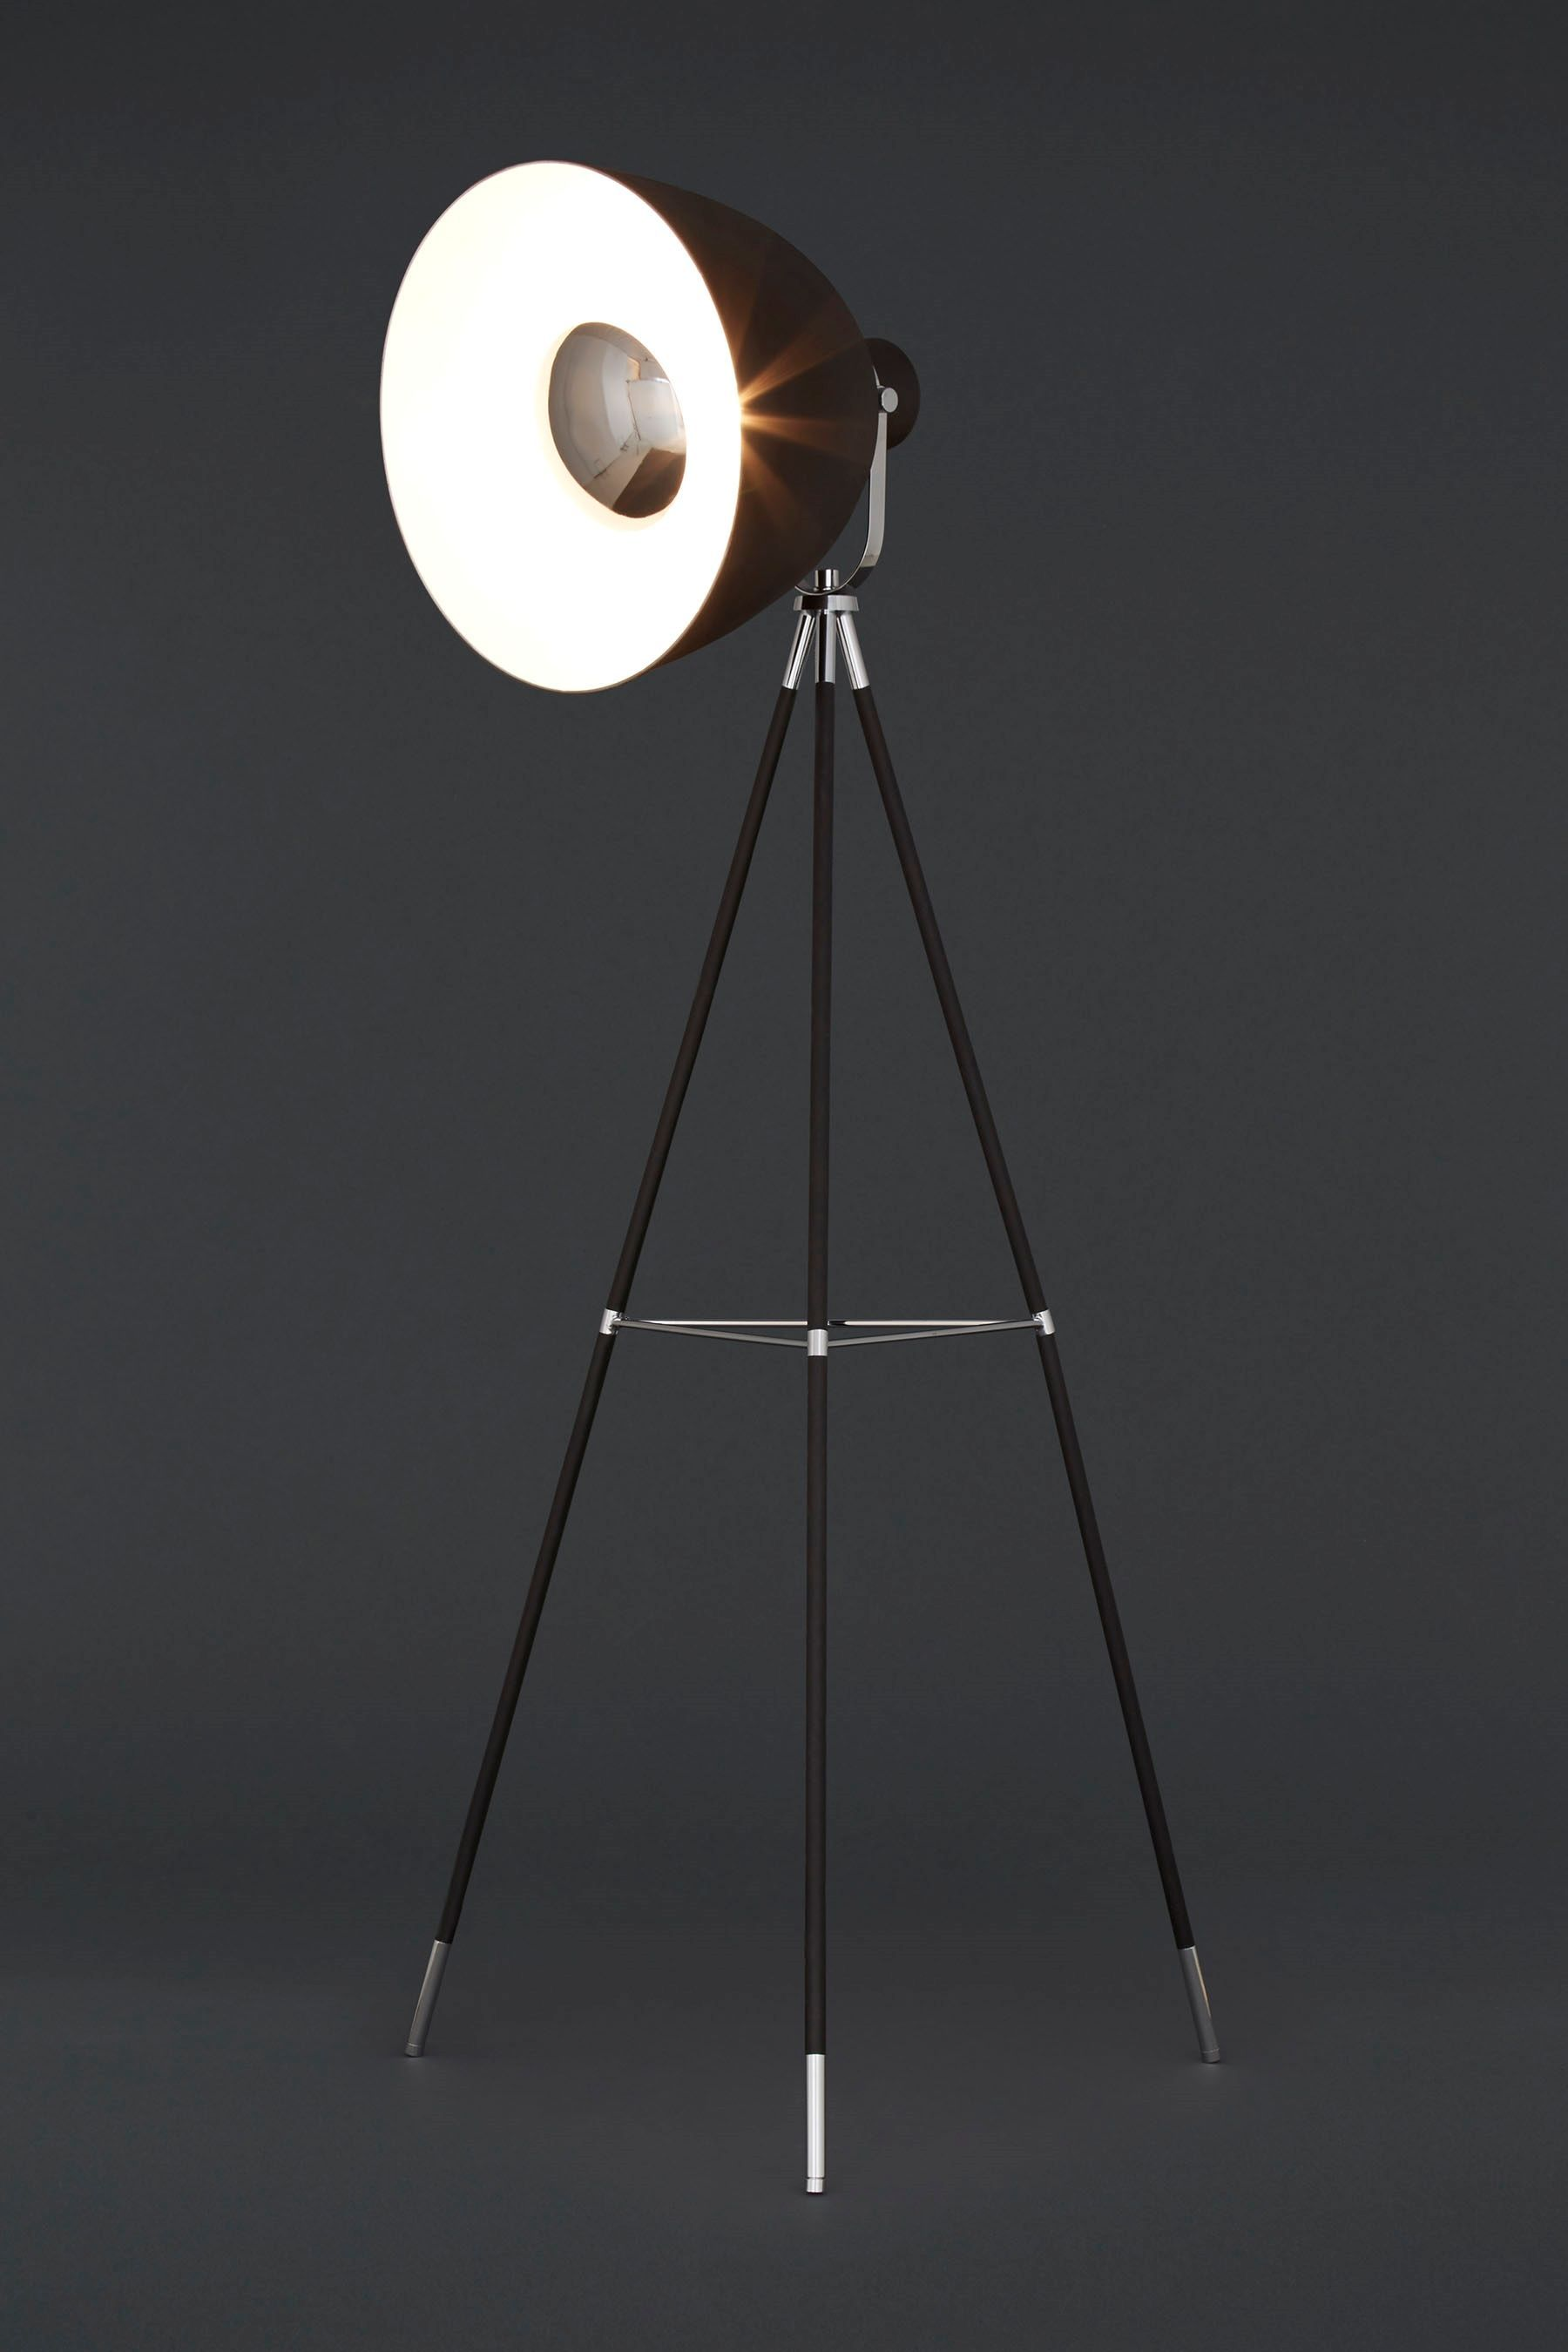 Buy studio black and chrome tripod floor lamp from the next uk buy studio black and chrome tripod floor lamp from the next uk online shop aloadofball Choice Image